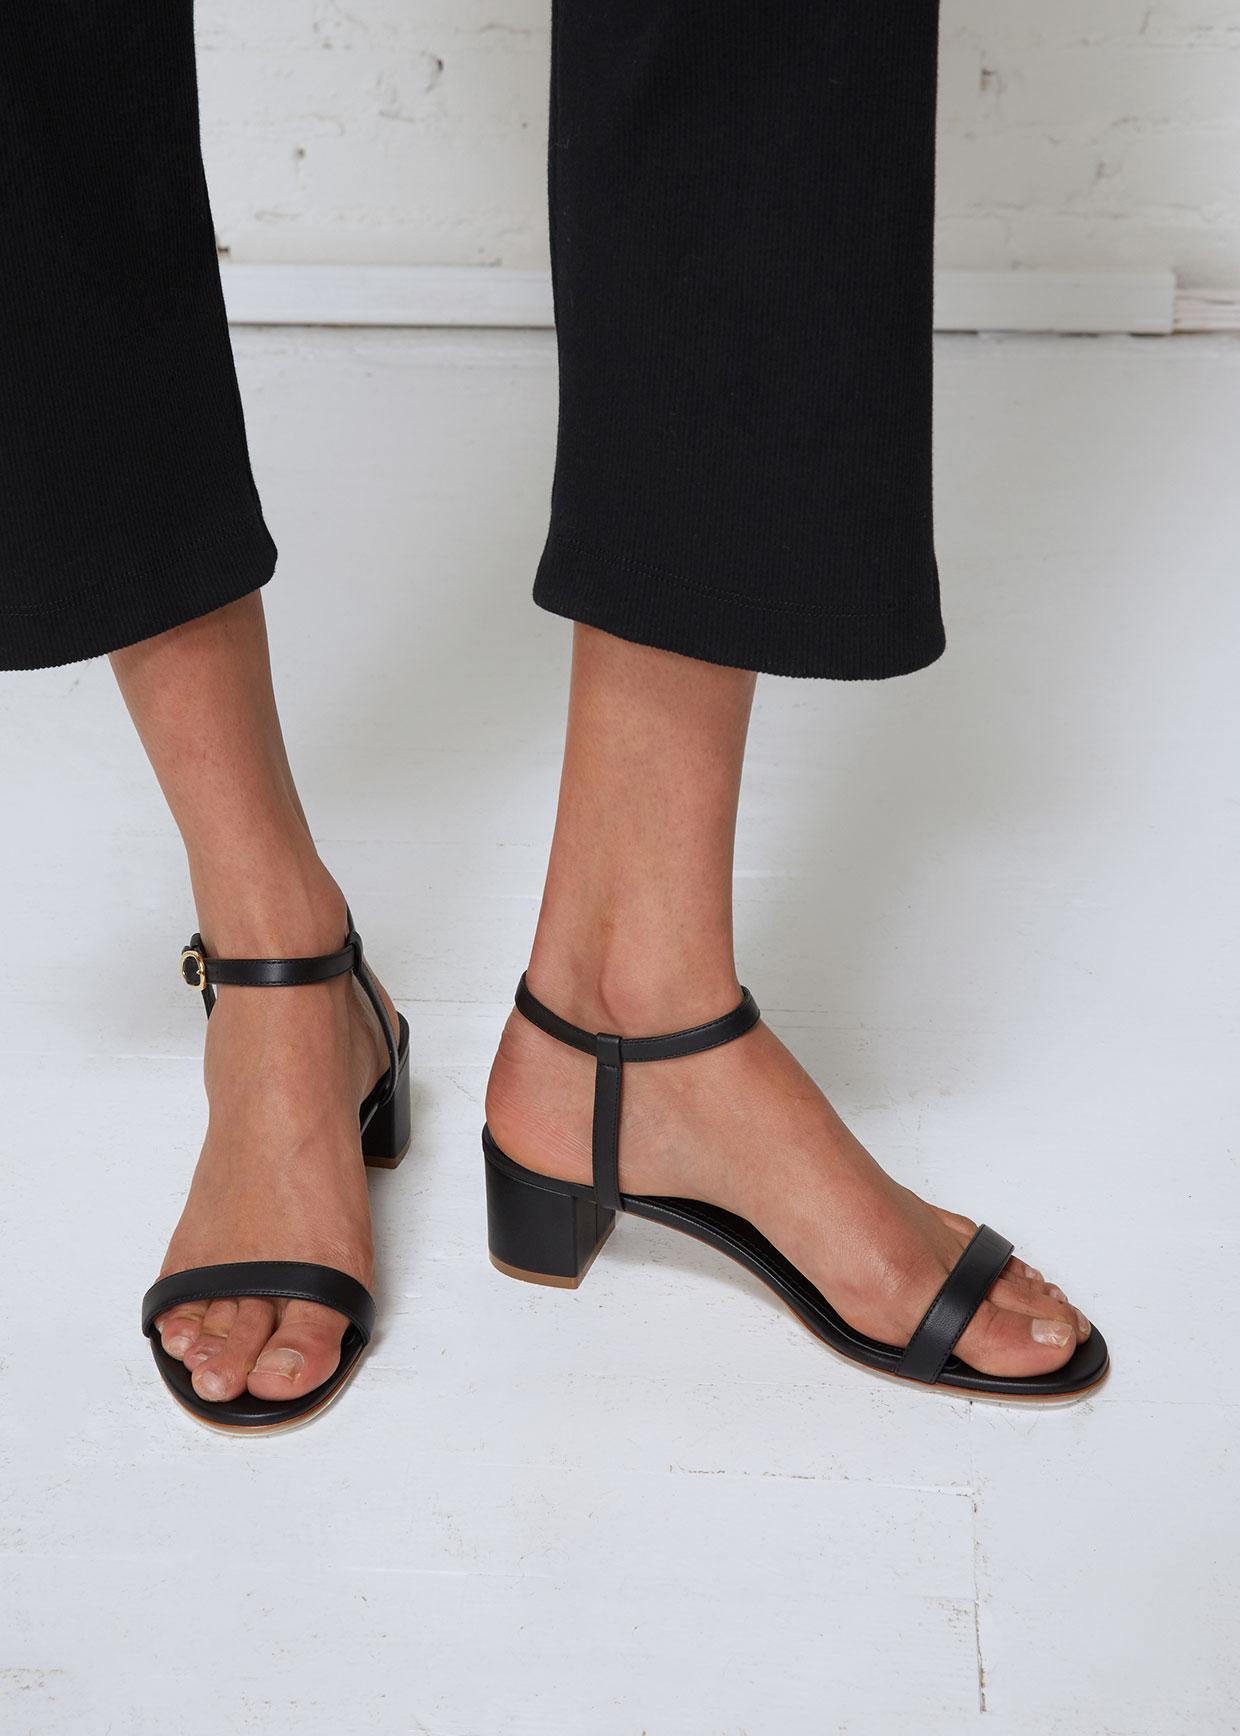 80f6cc145537 Mansur Gavriel Ankle Strap Sandal in Black - Lyst